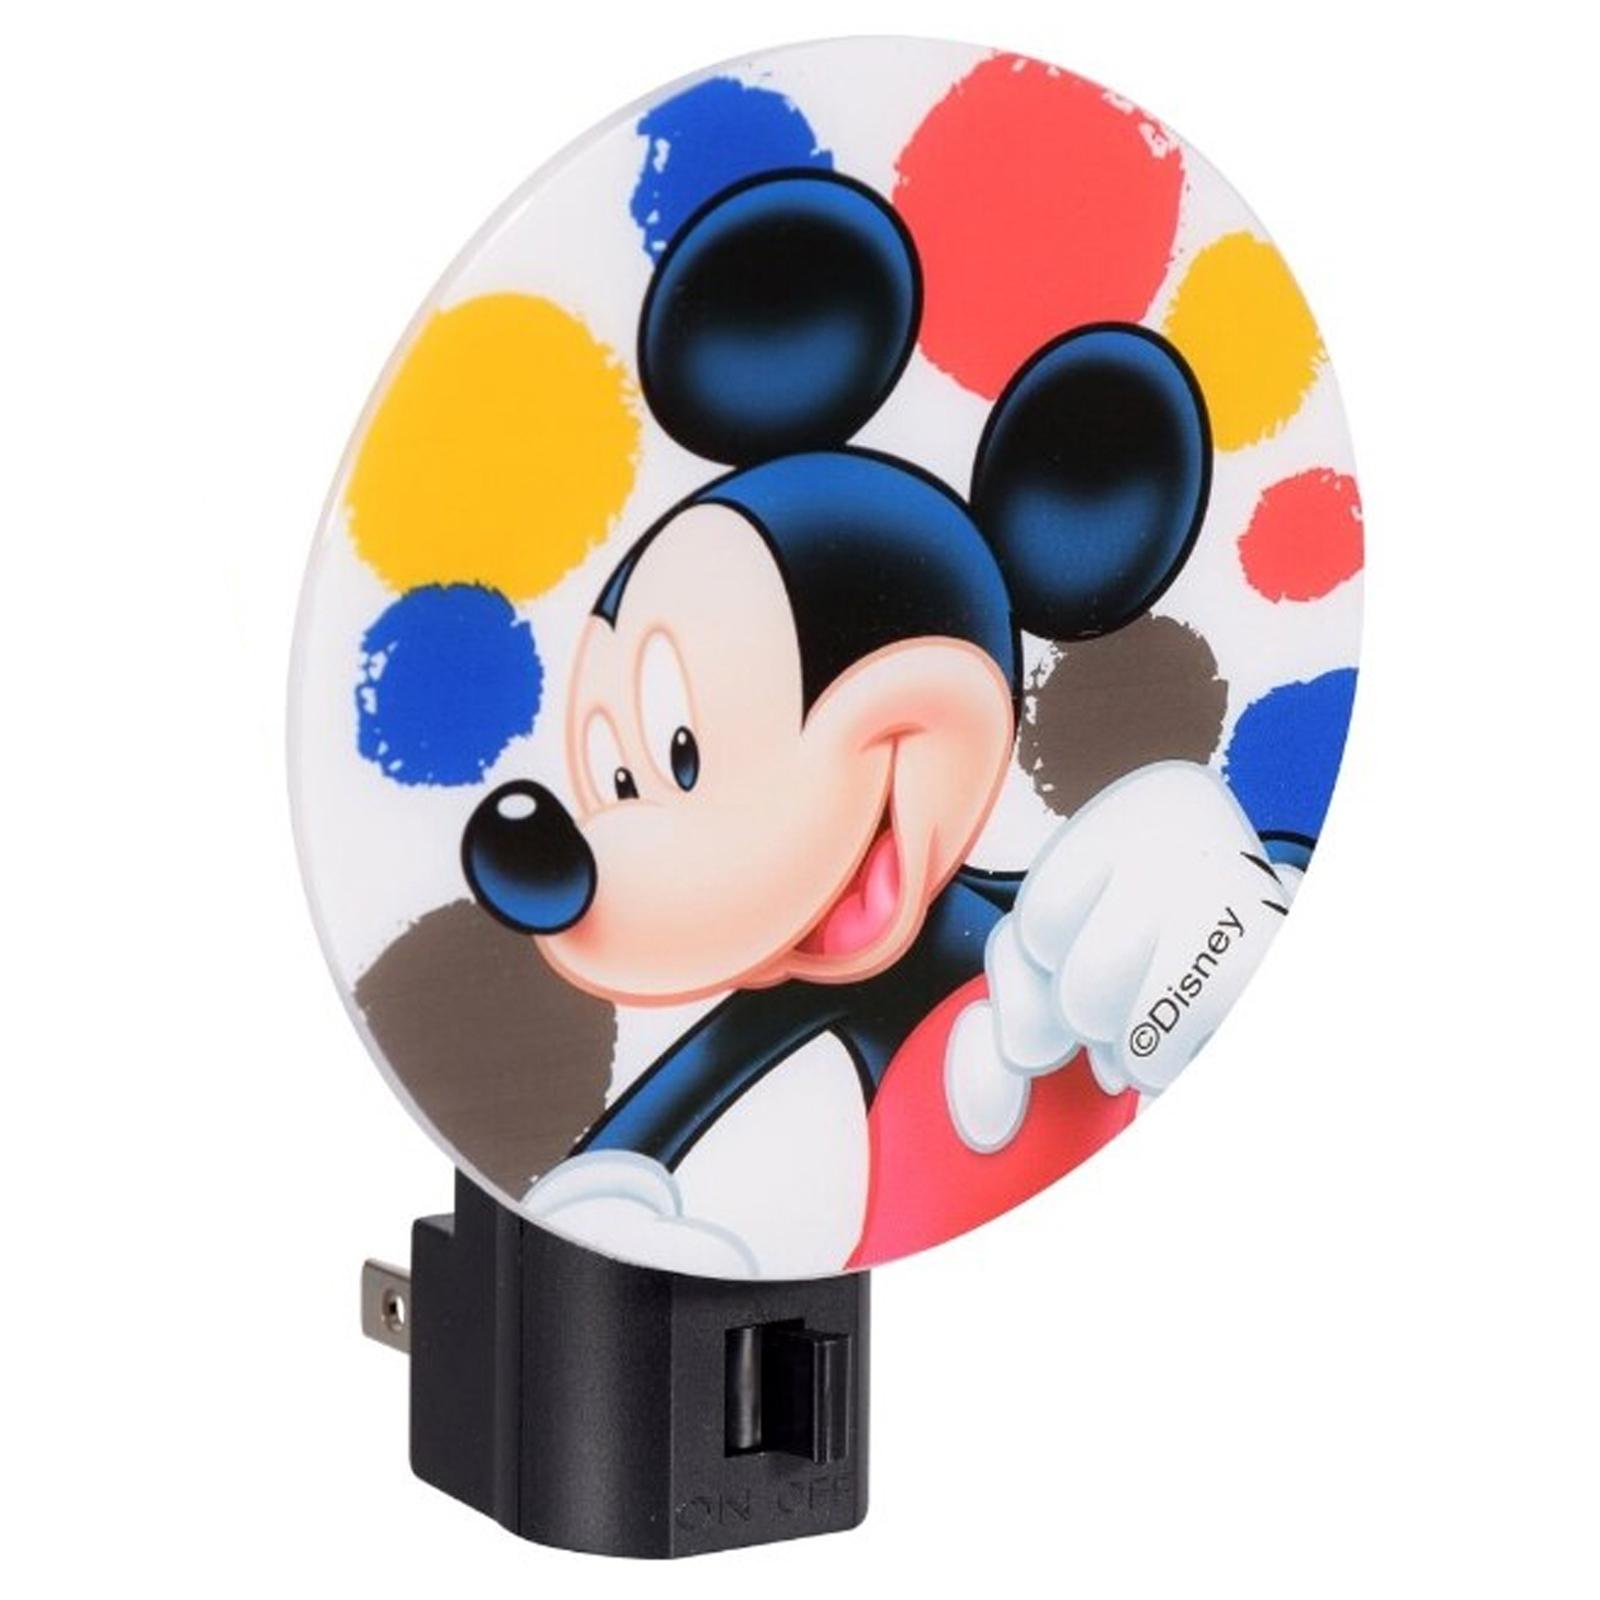 Mickey Mouse Kids Adjustable Rotary Plug-in Night Light